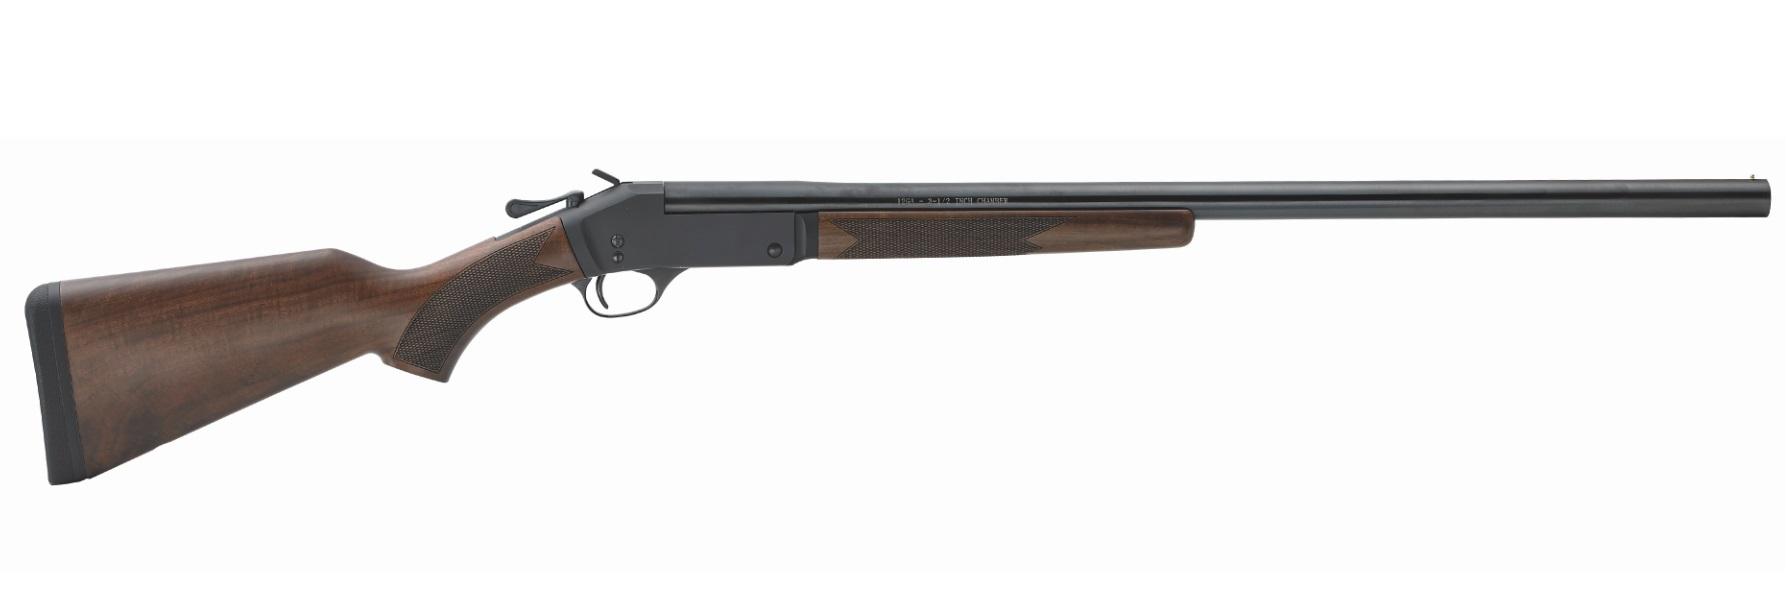 Henry Repeating Arms Henry Singleshot Shotgun 12 Gauge